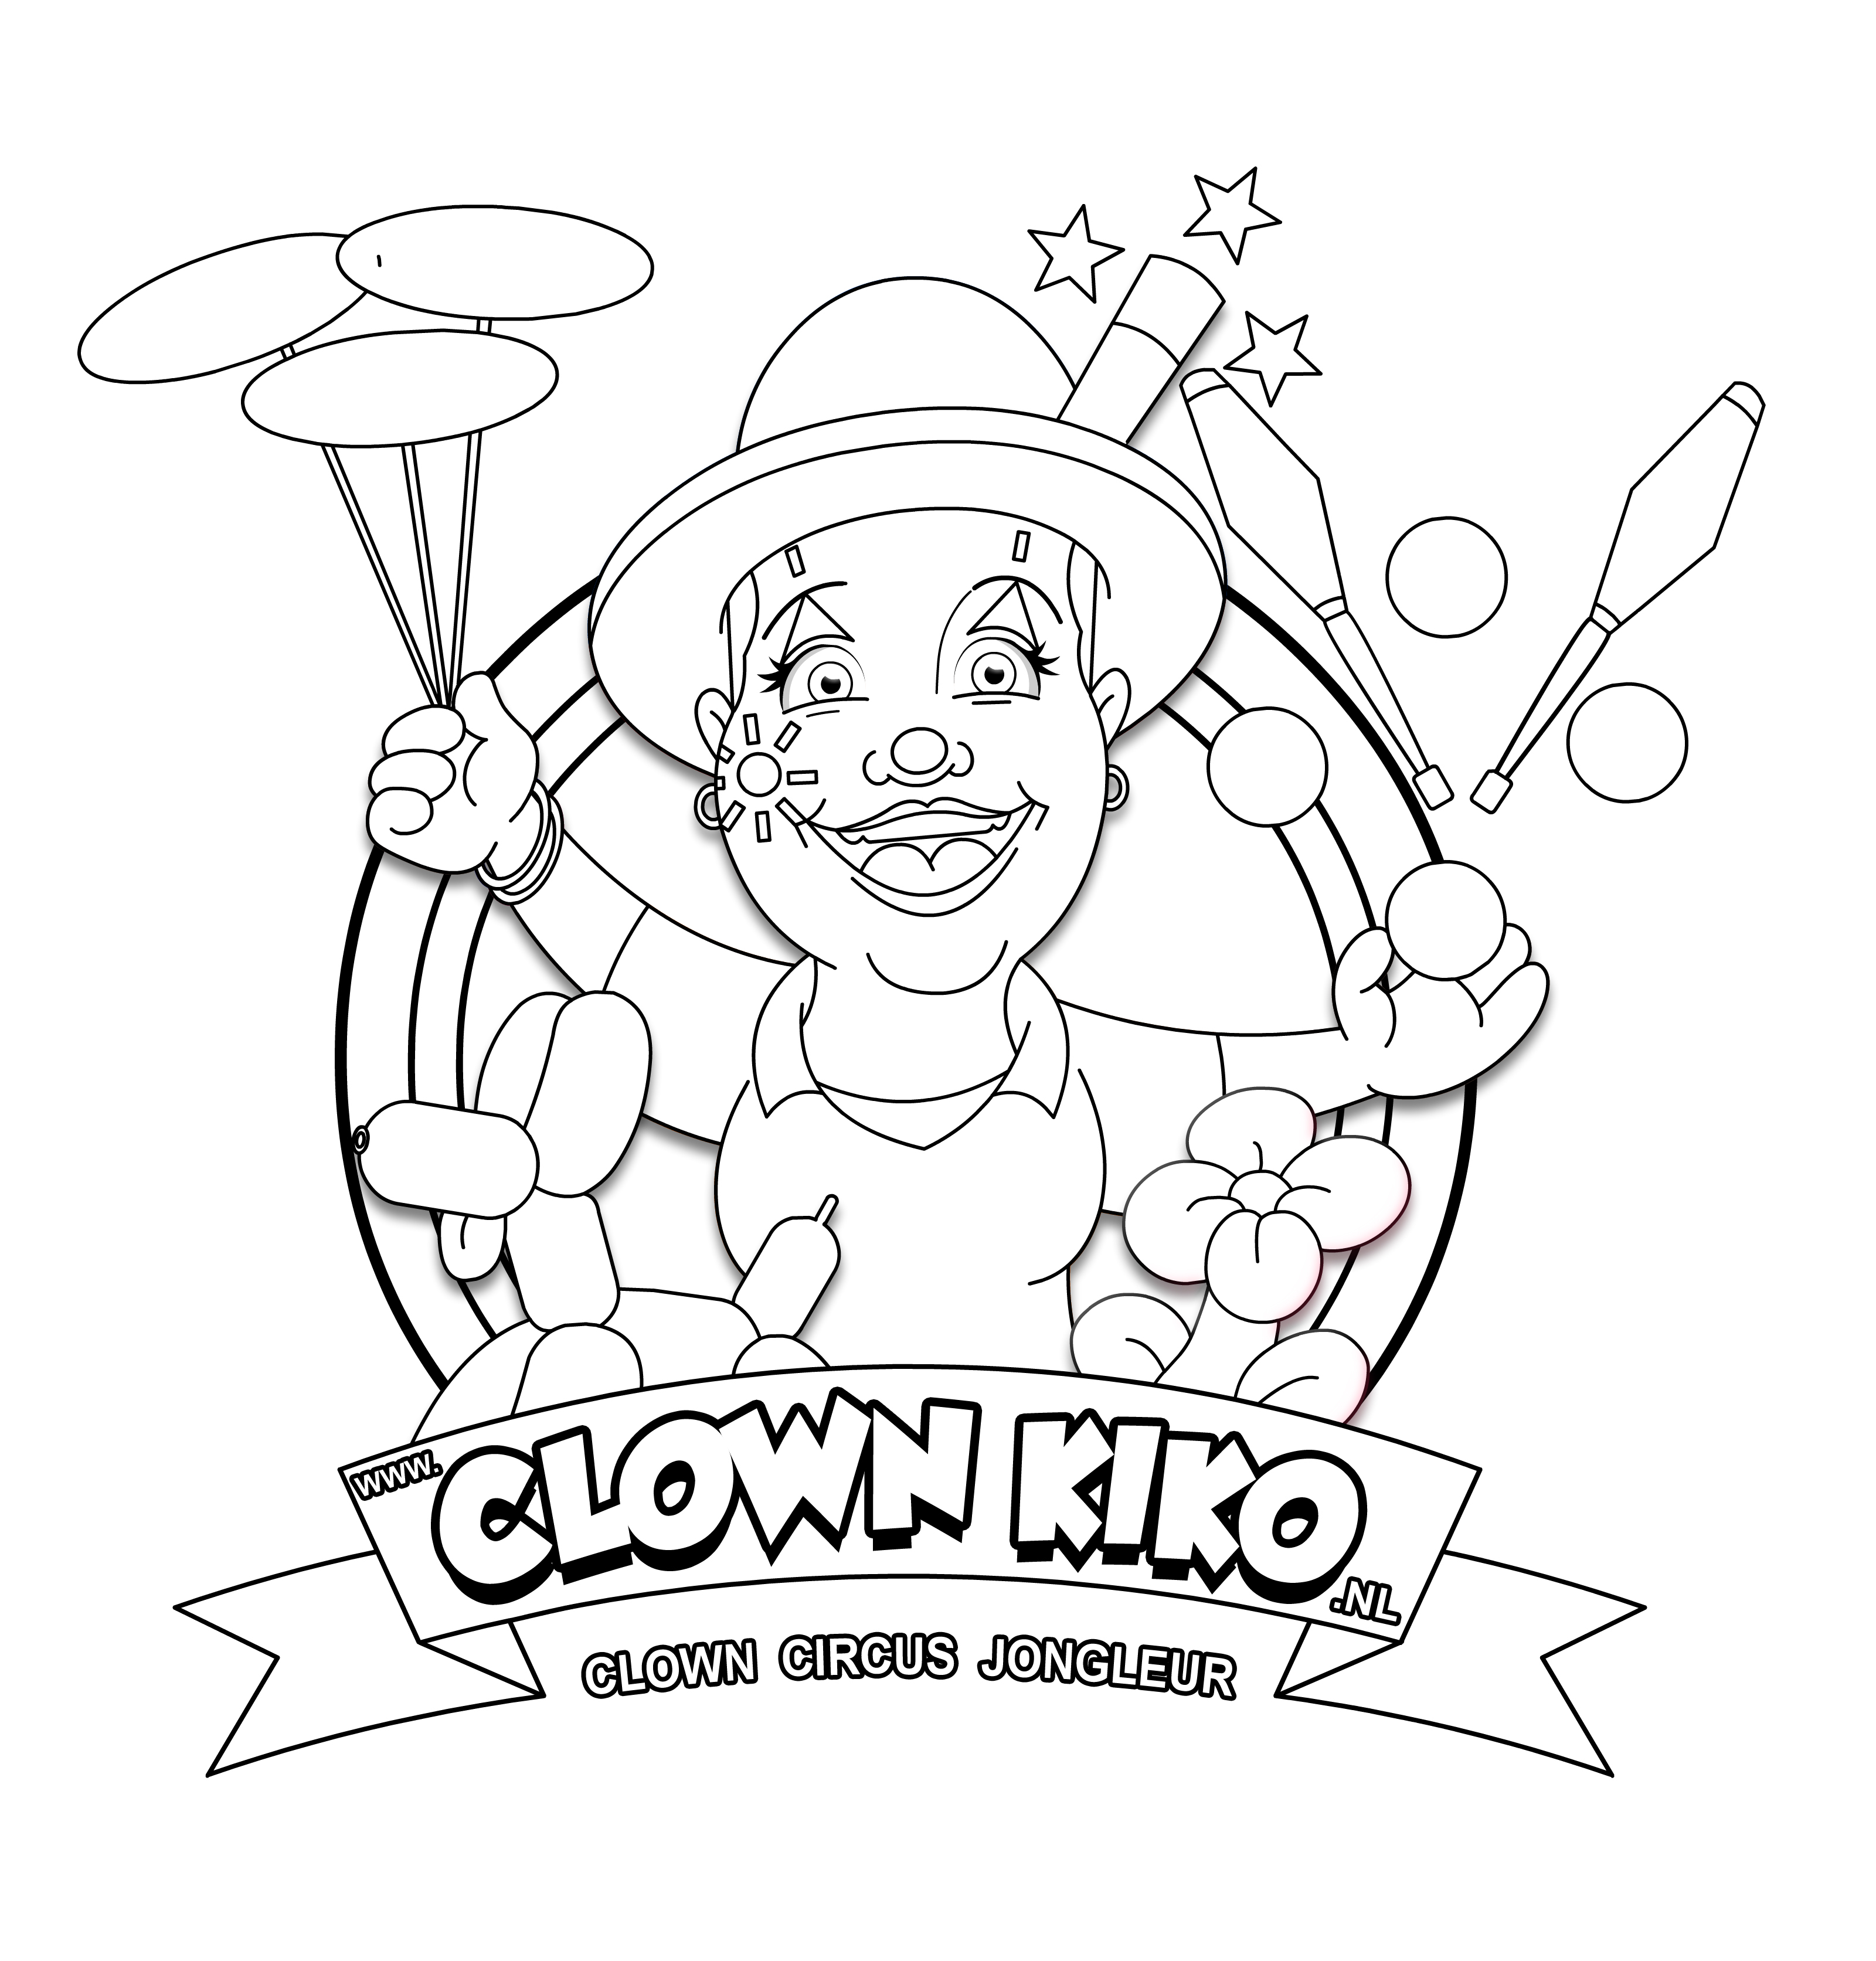 Clown Kiko Kleurplaat